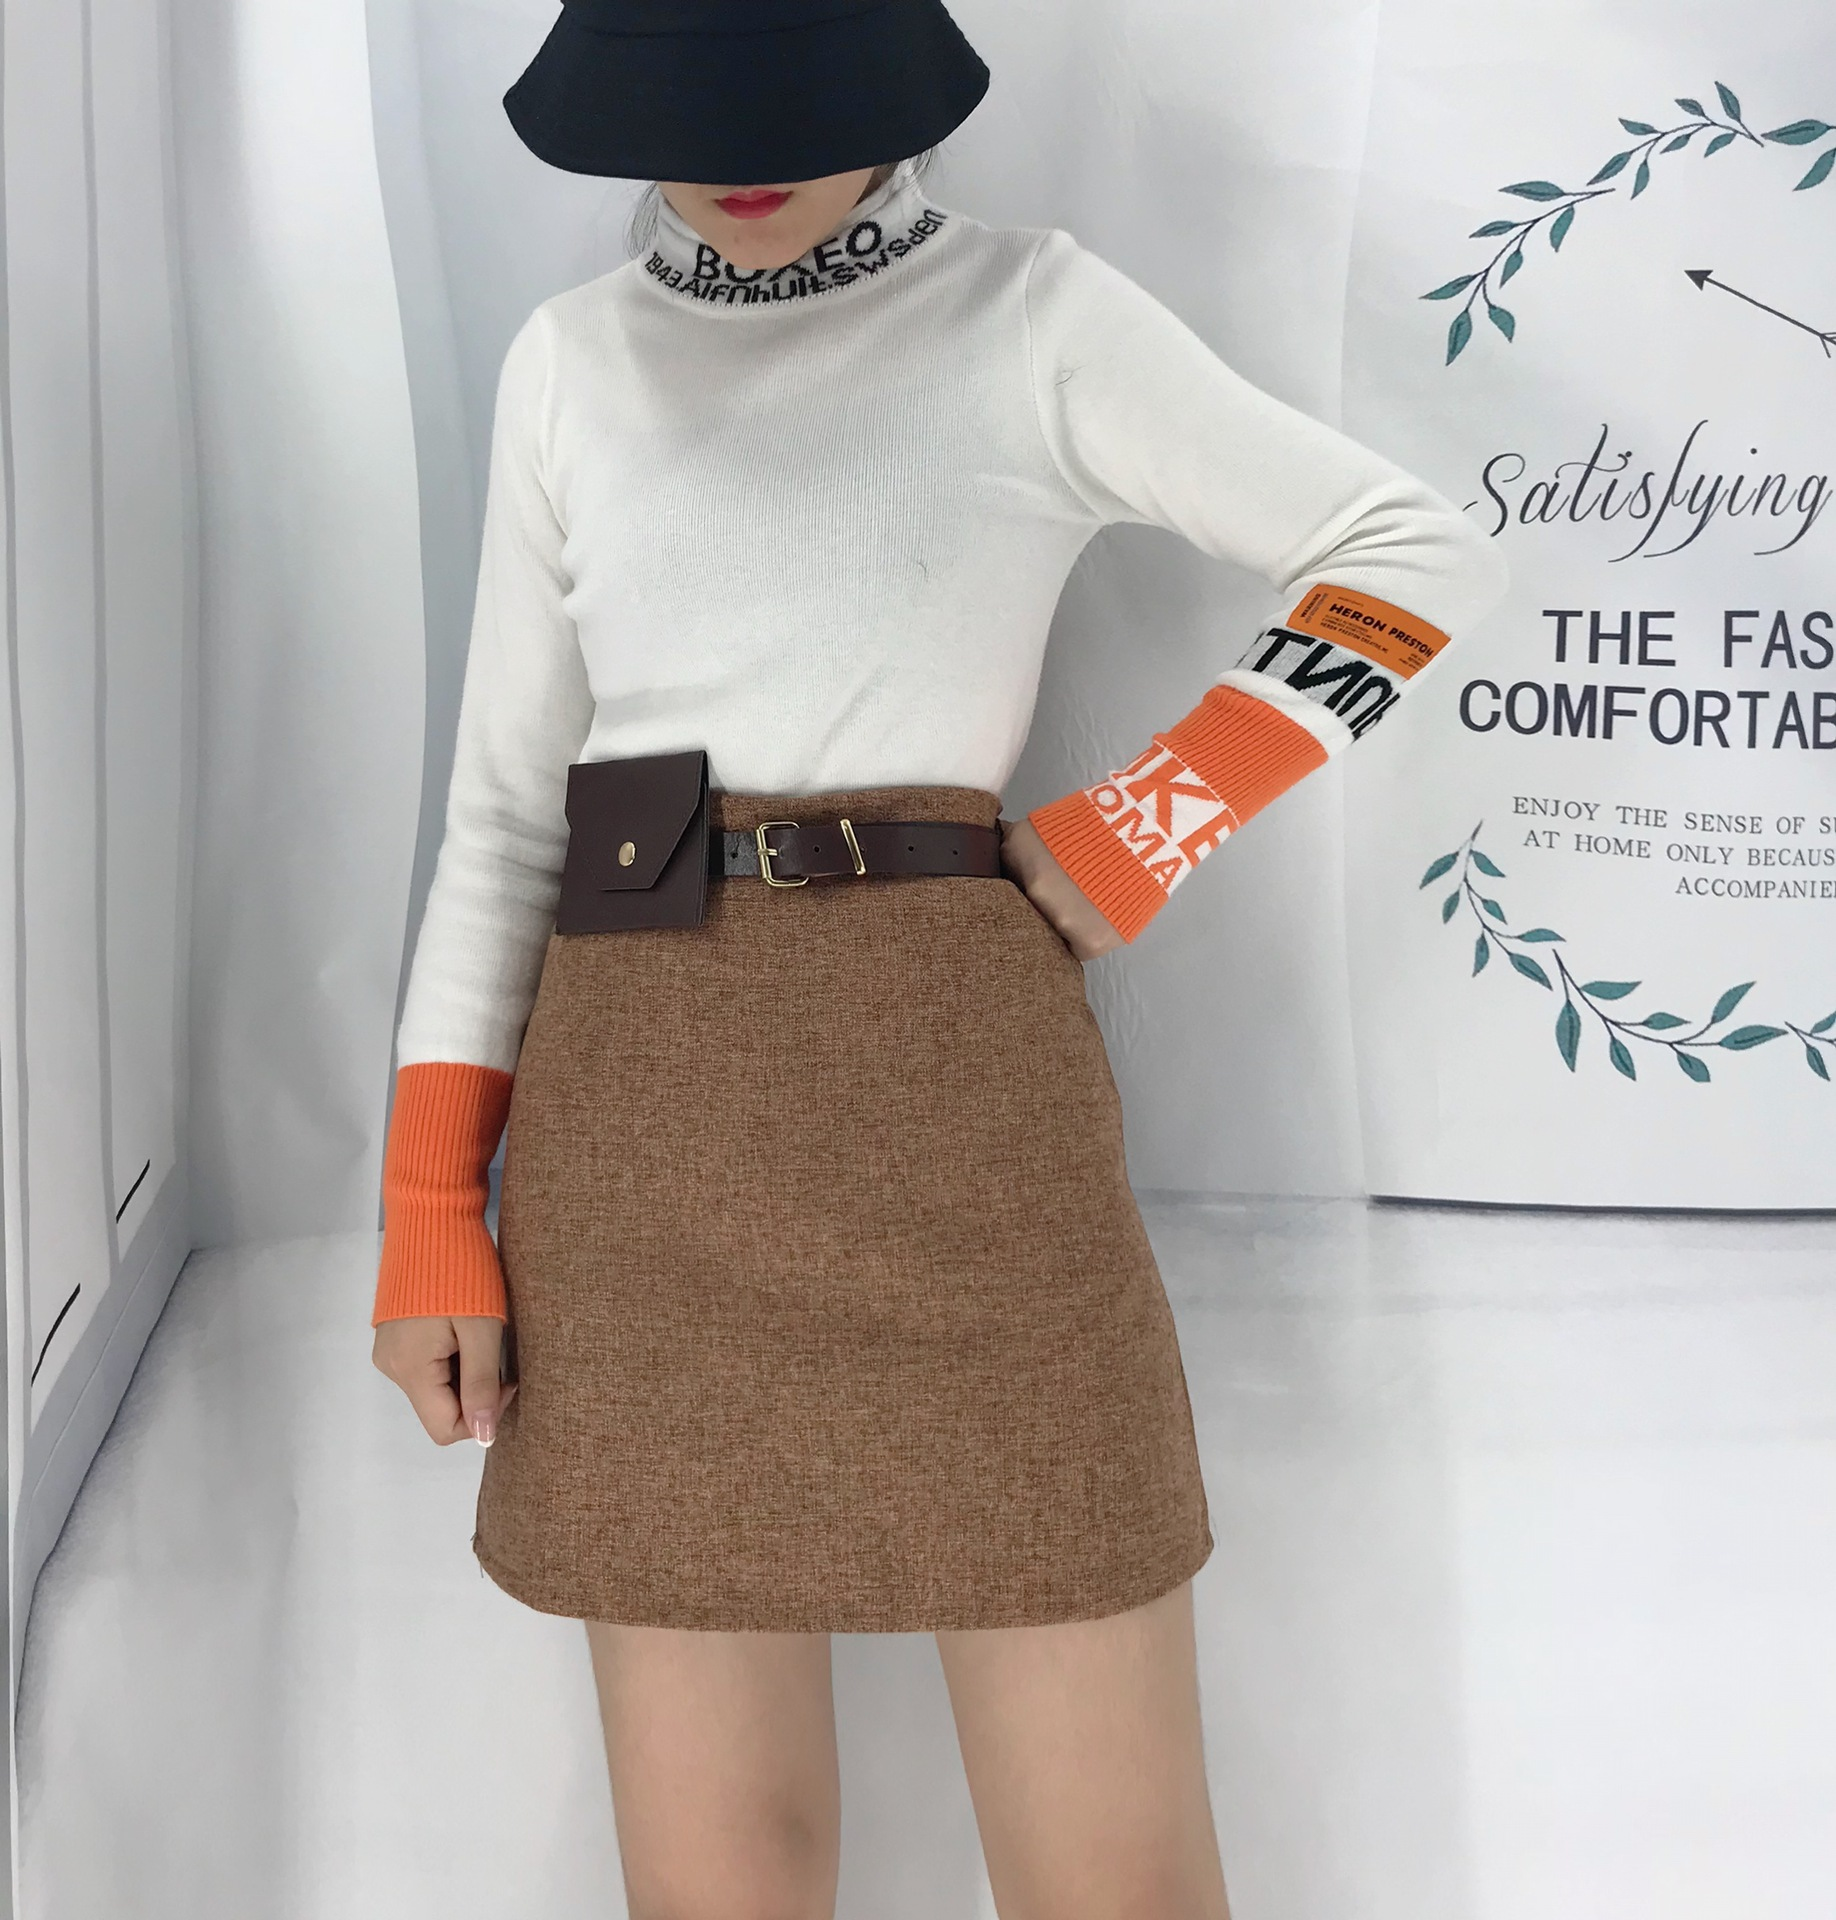 Photo Shoot 2019 Autumn New Style Korean-style Retro High-waisted A- Line Skirt Skirt Women's Fashion PU Leather Wallet Sheath S